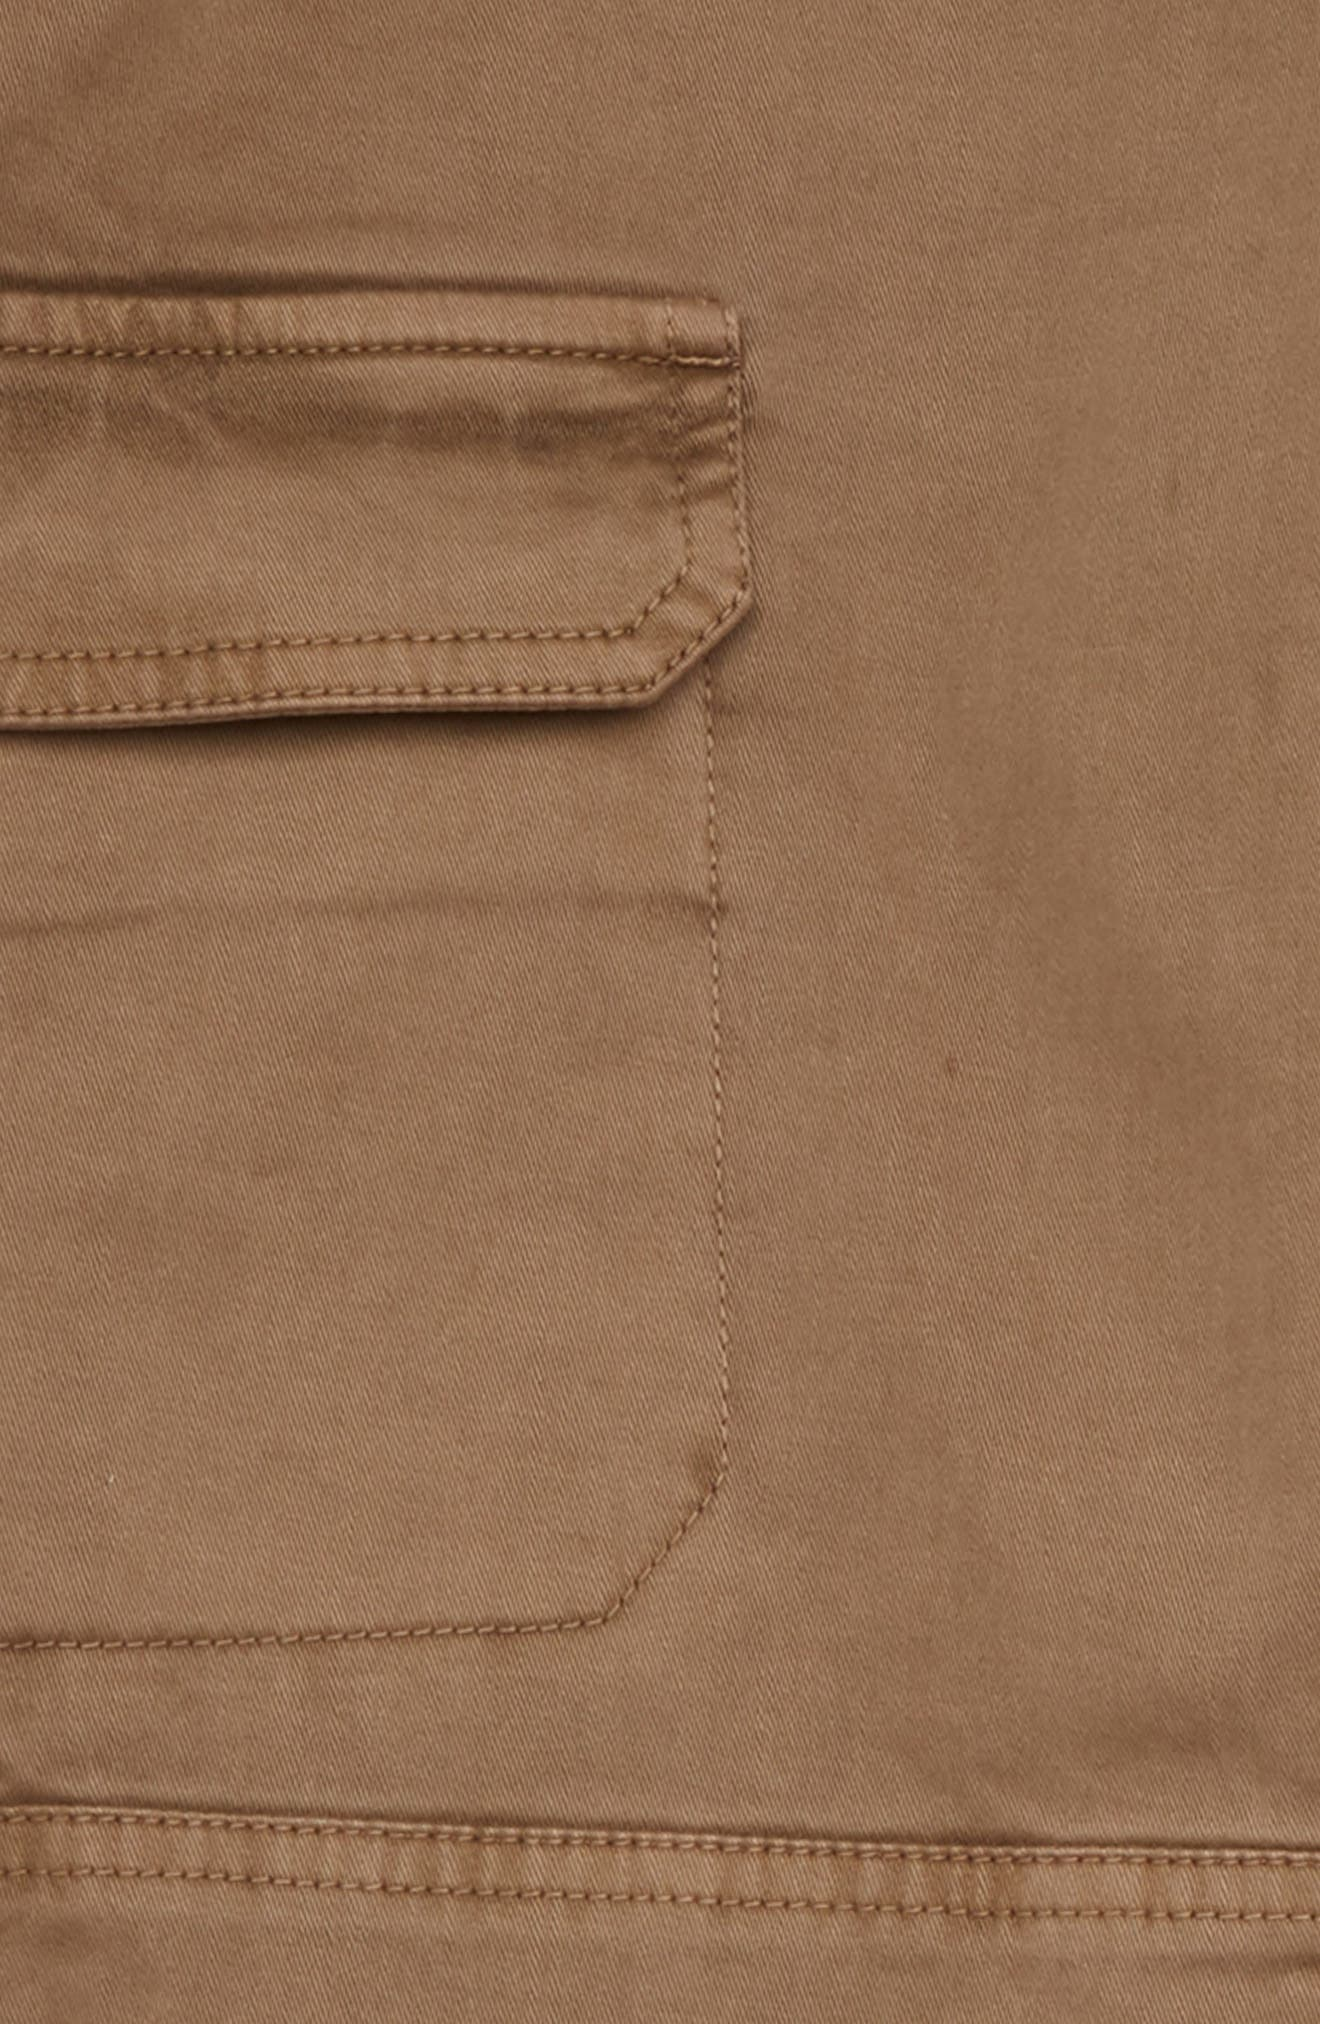 Cargo Jogger Pants,                             Alternate thumbnail 2, color,                             BROWN CUB